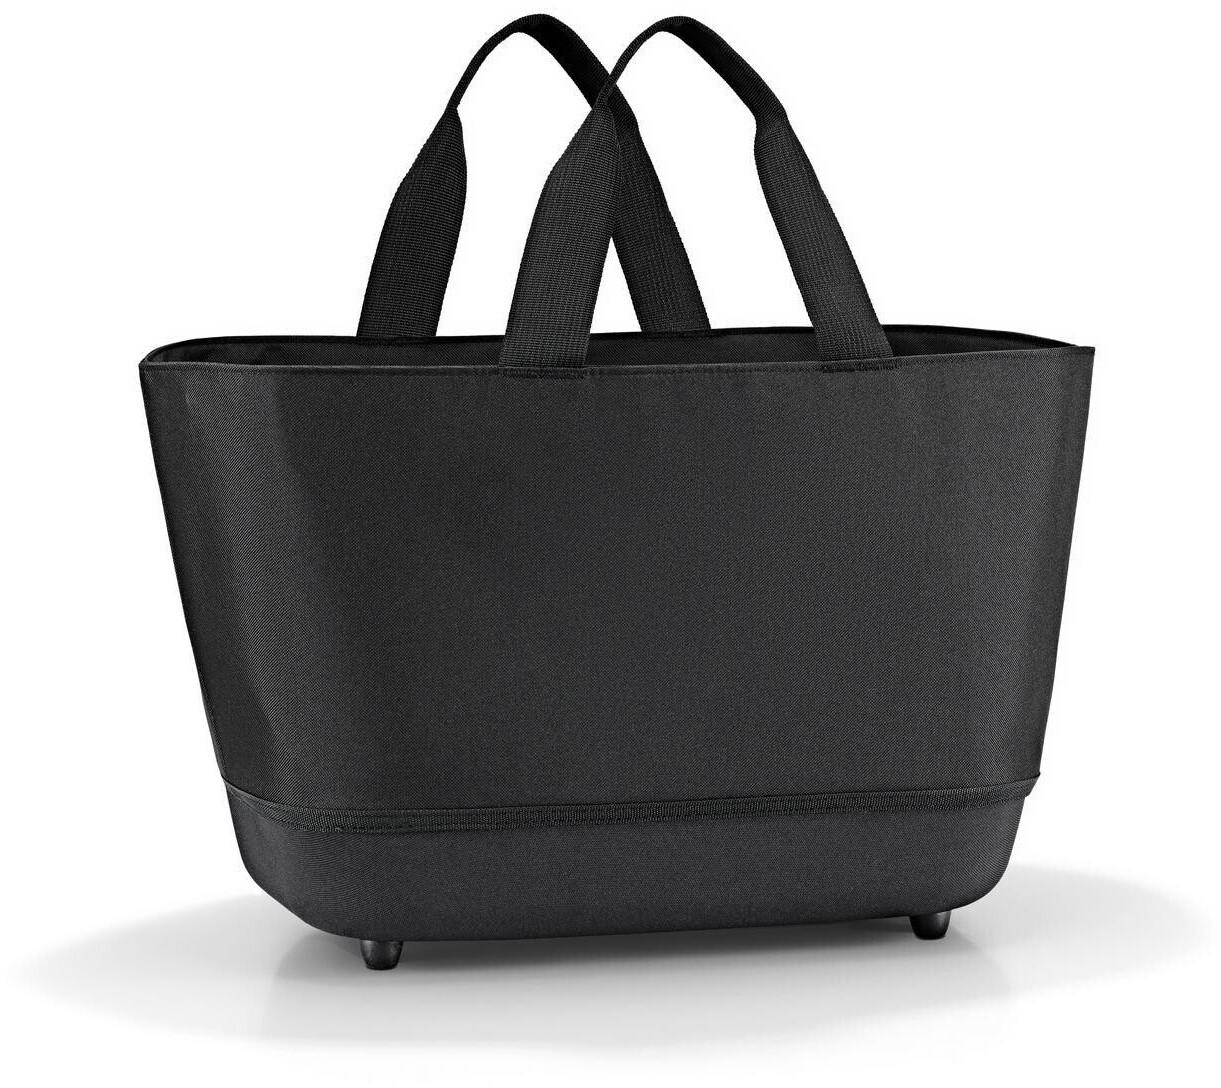 Reisenthel Shoppingbasket black